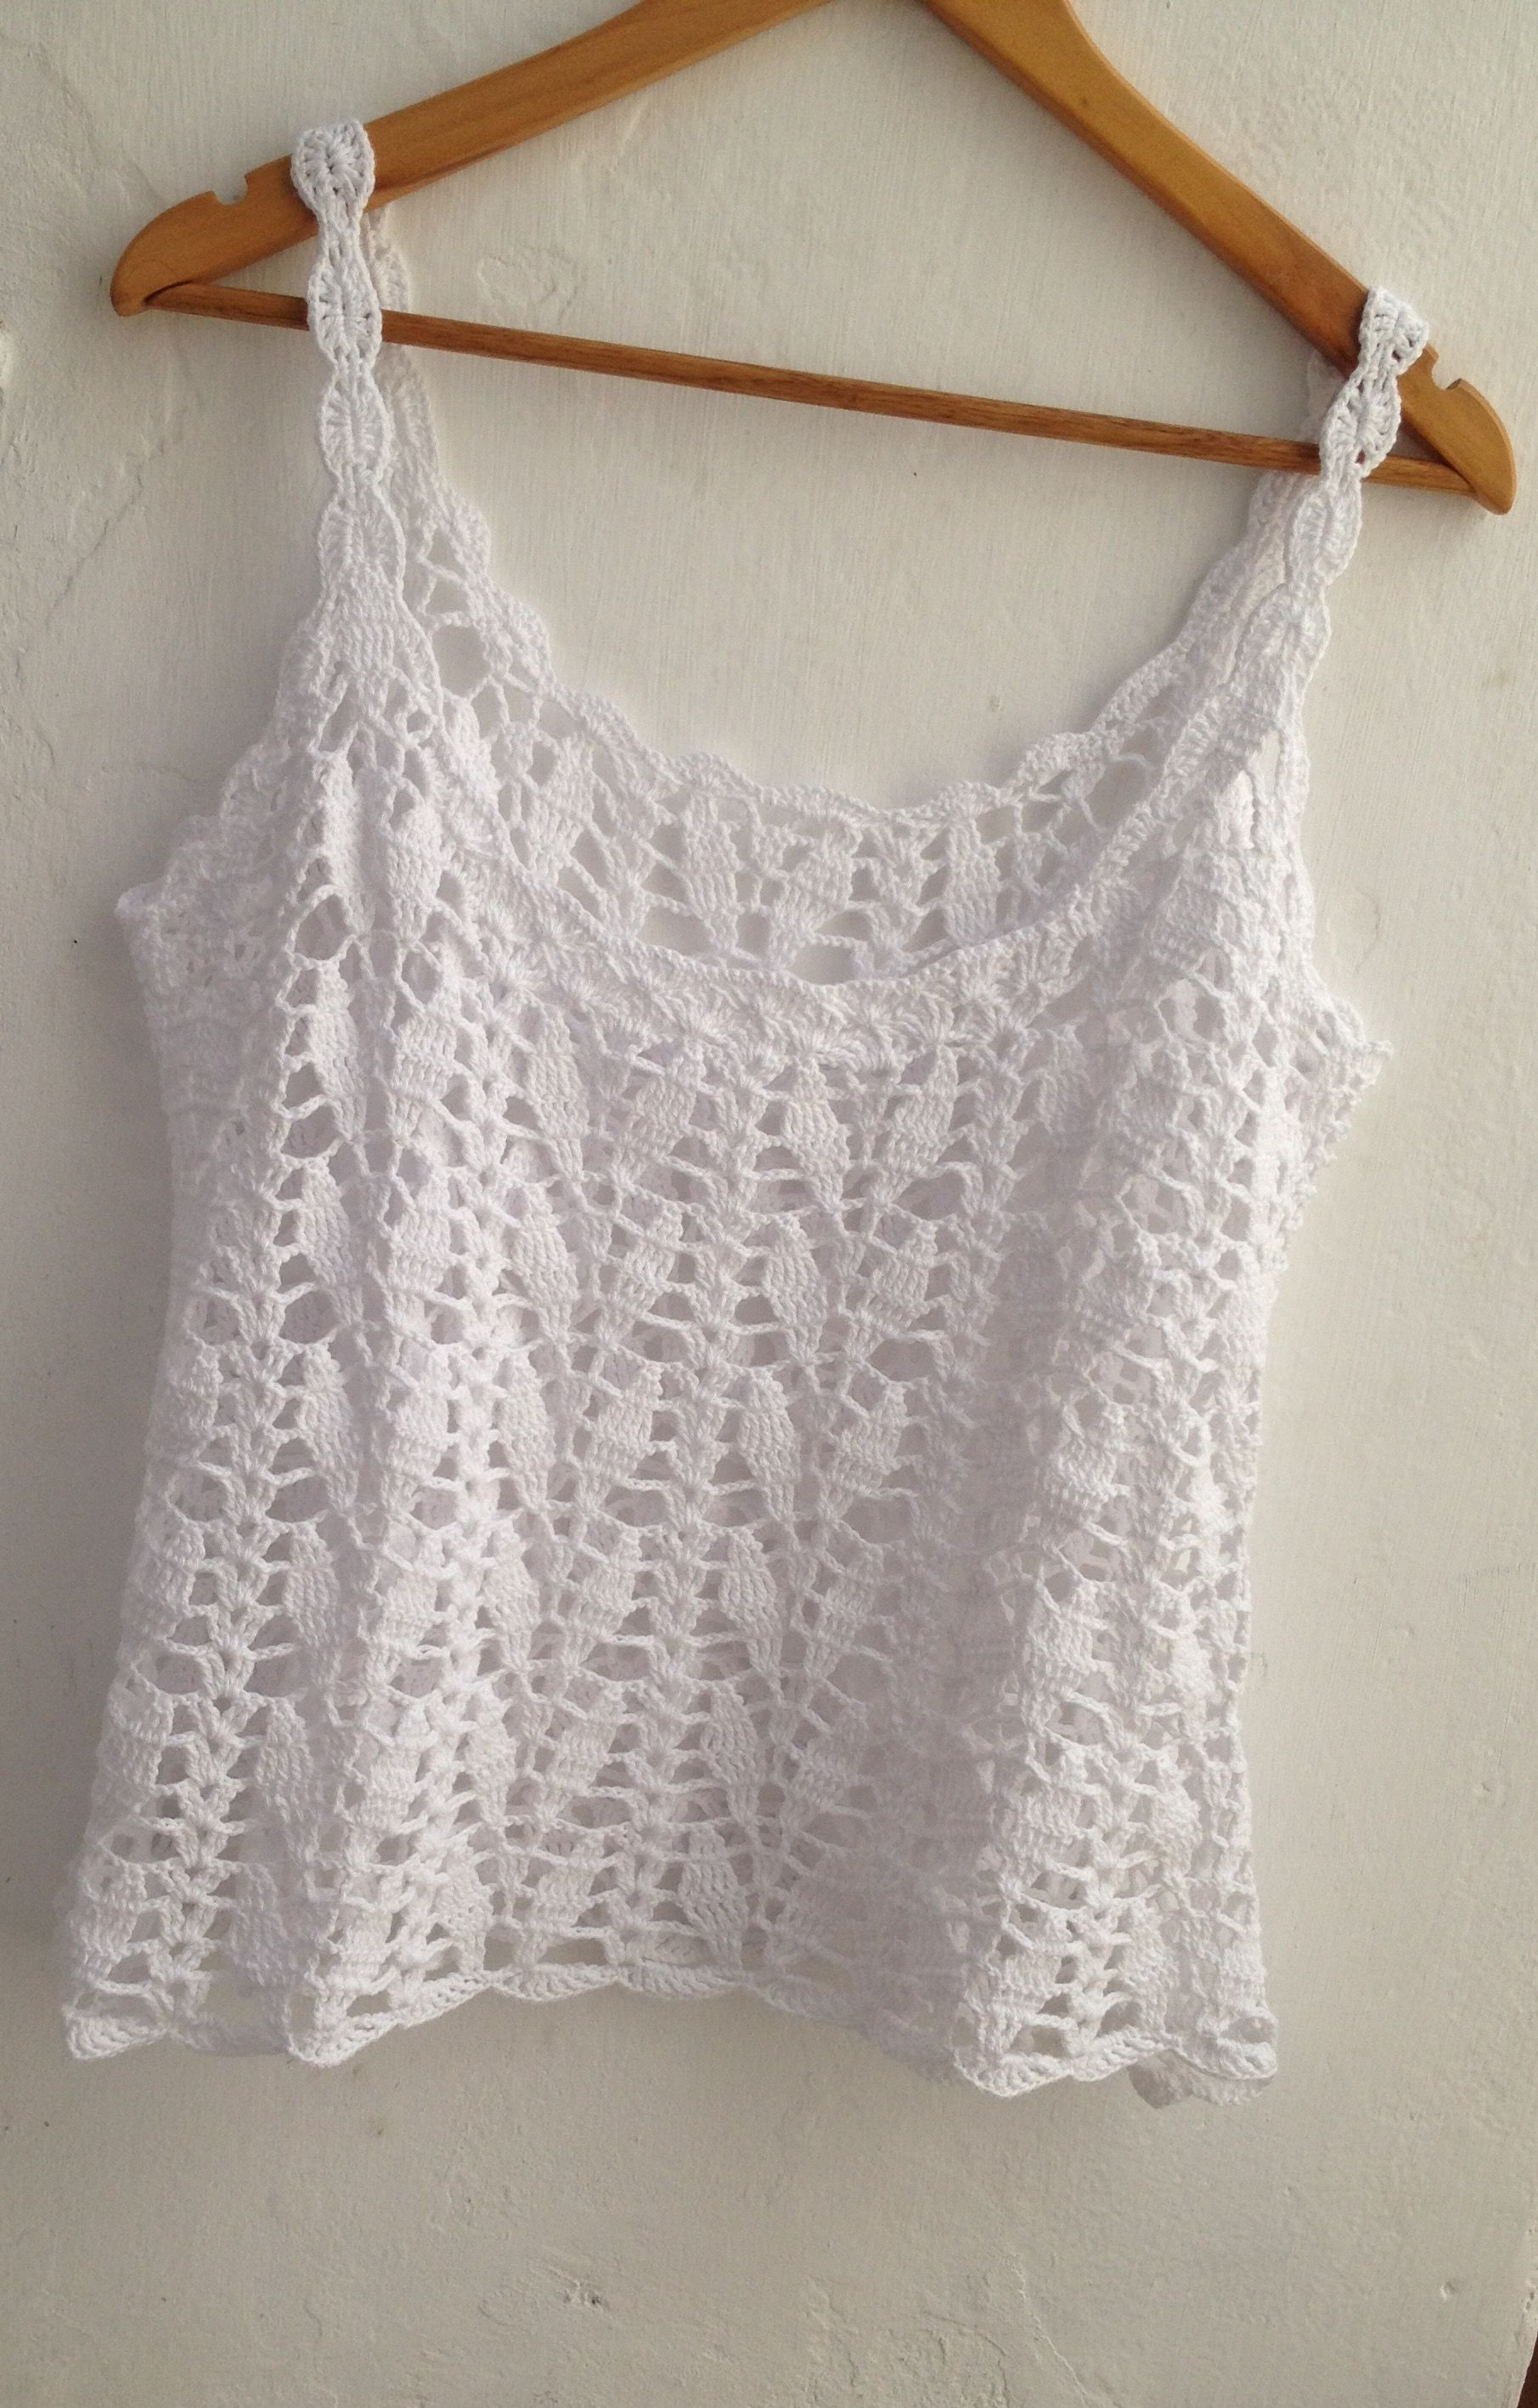 Blusa tejida a crochet | crochet | Pinterest | Croché, Ganchillo y ...